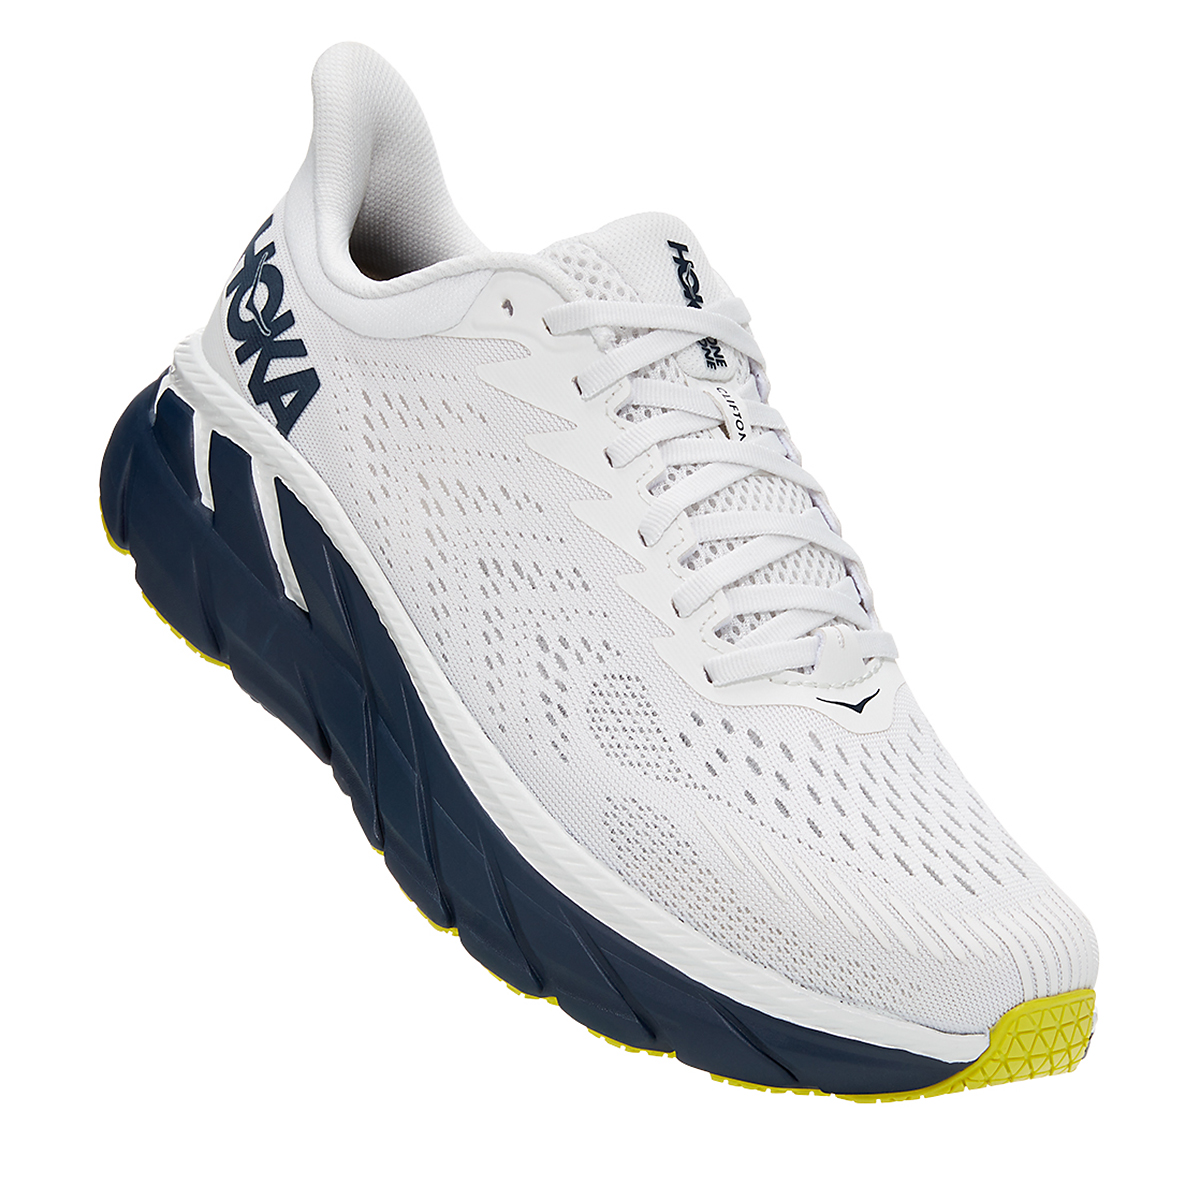 Men's Hoka One One Clifton 7 Running Shoe - Color: Blanc De Blanc - Size: 7 - Width: Regular, Blanc De Blanc, large, image 5